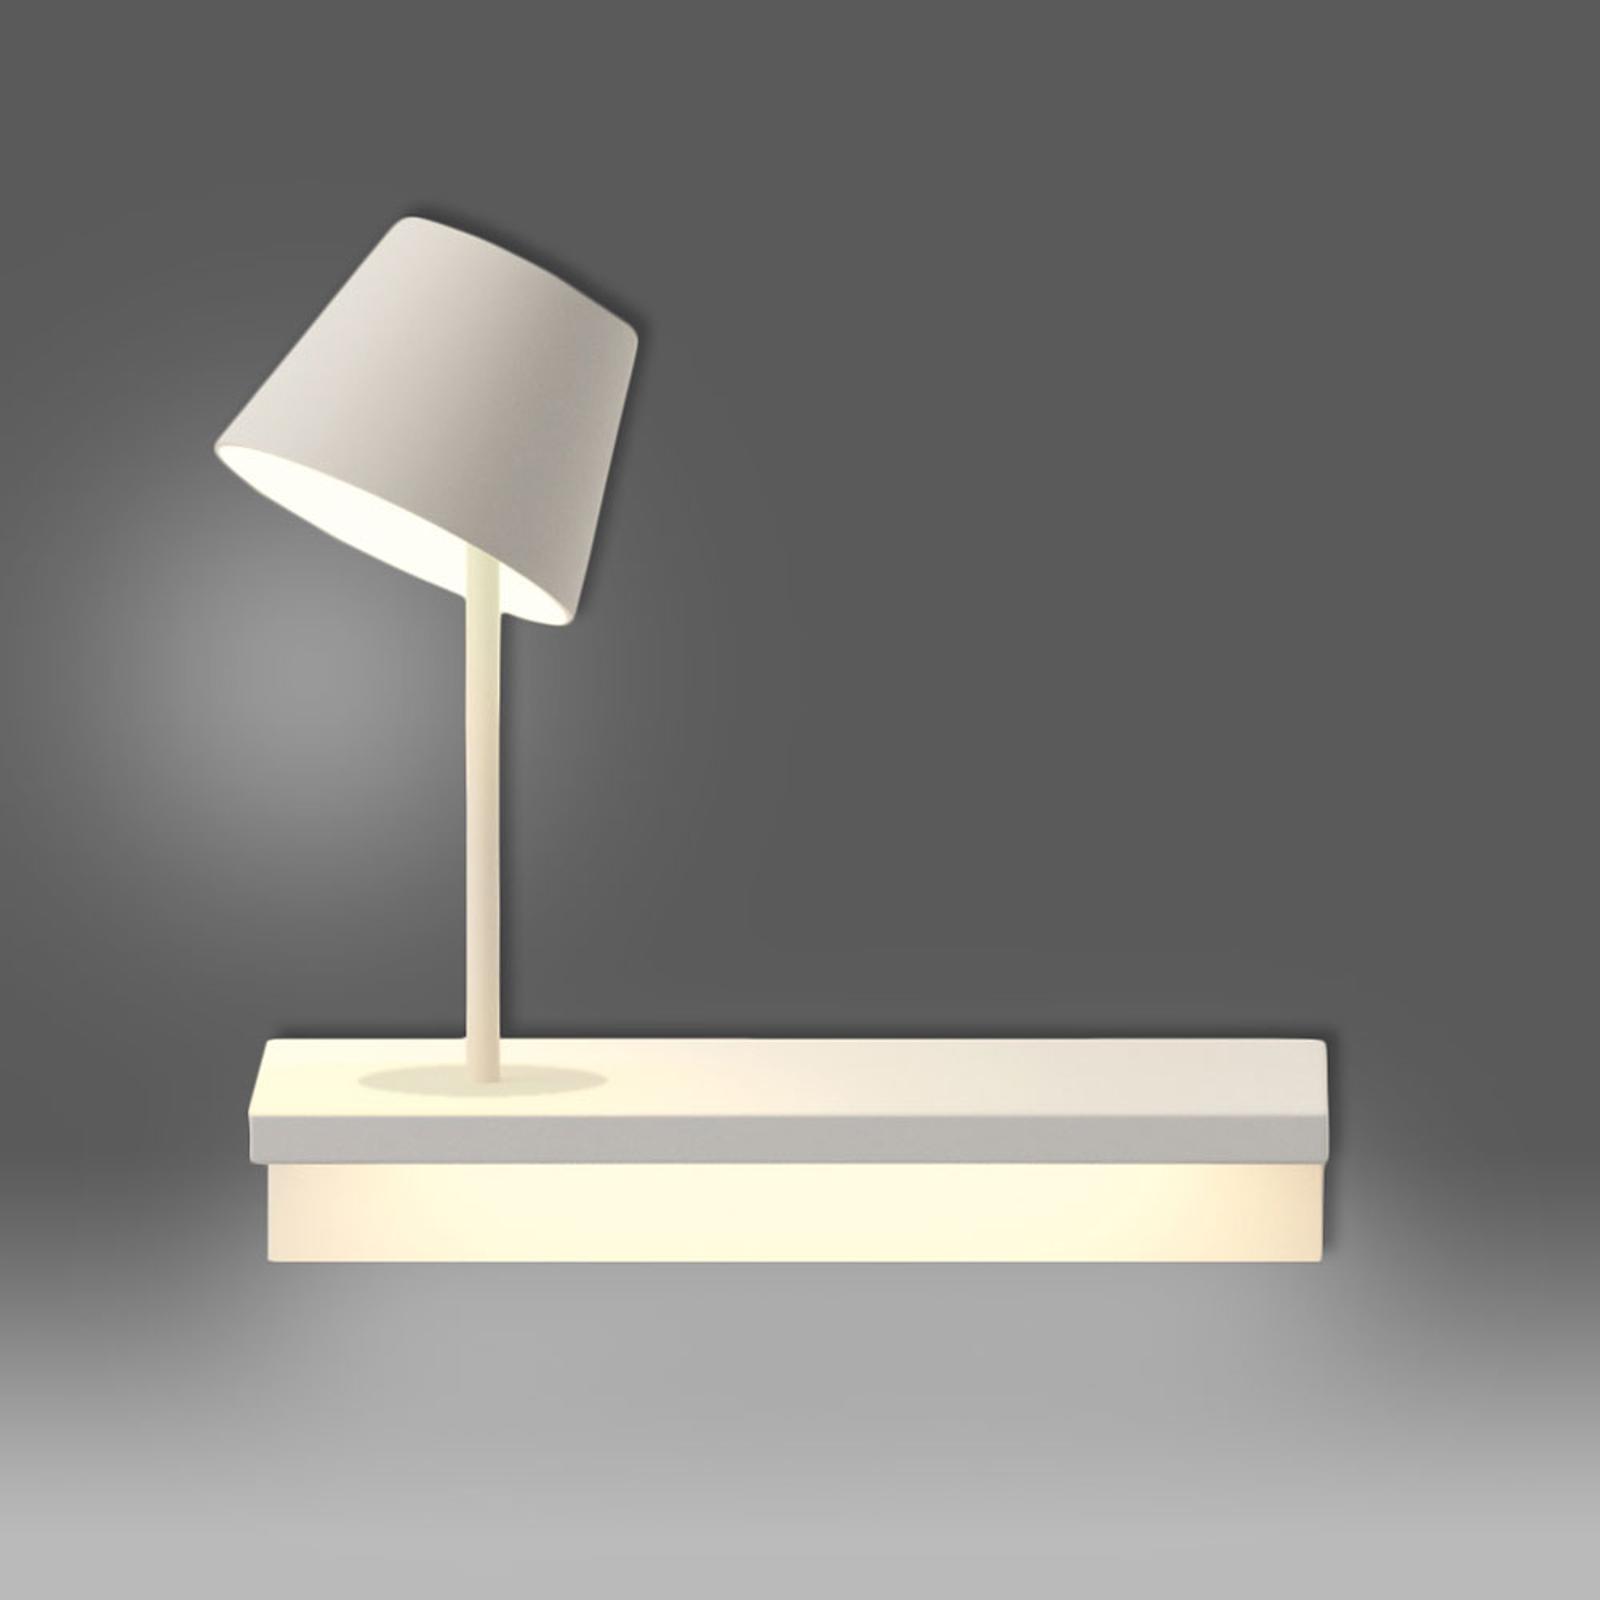 Moderni LED-seinävalaisin Suite 29 cm